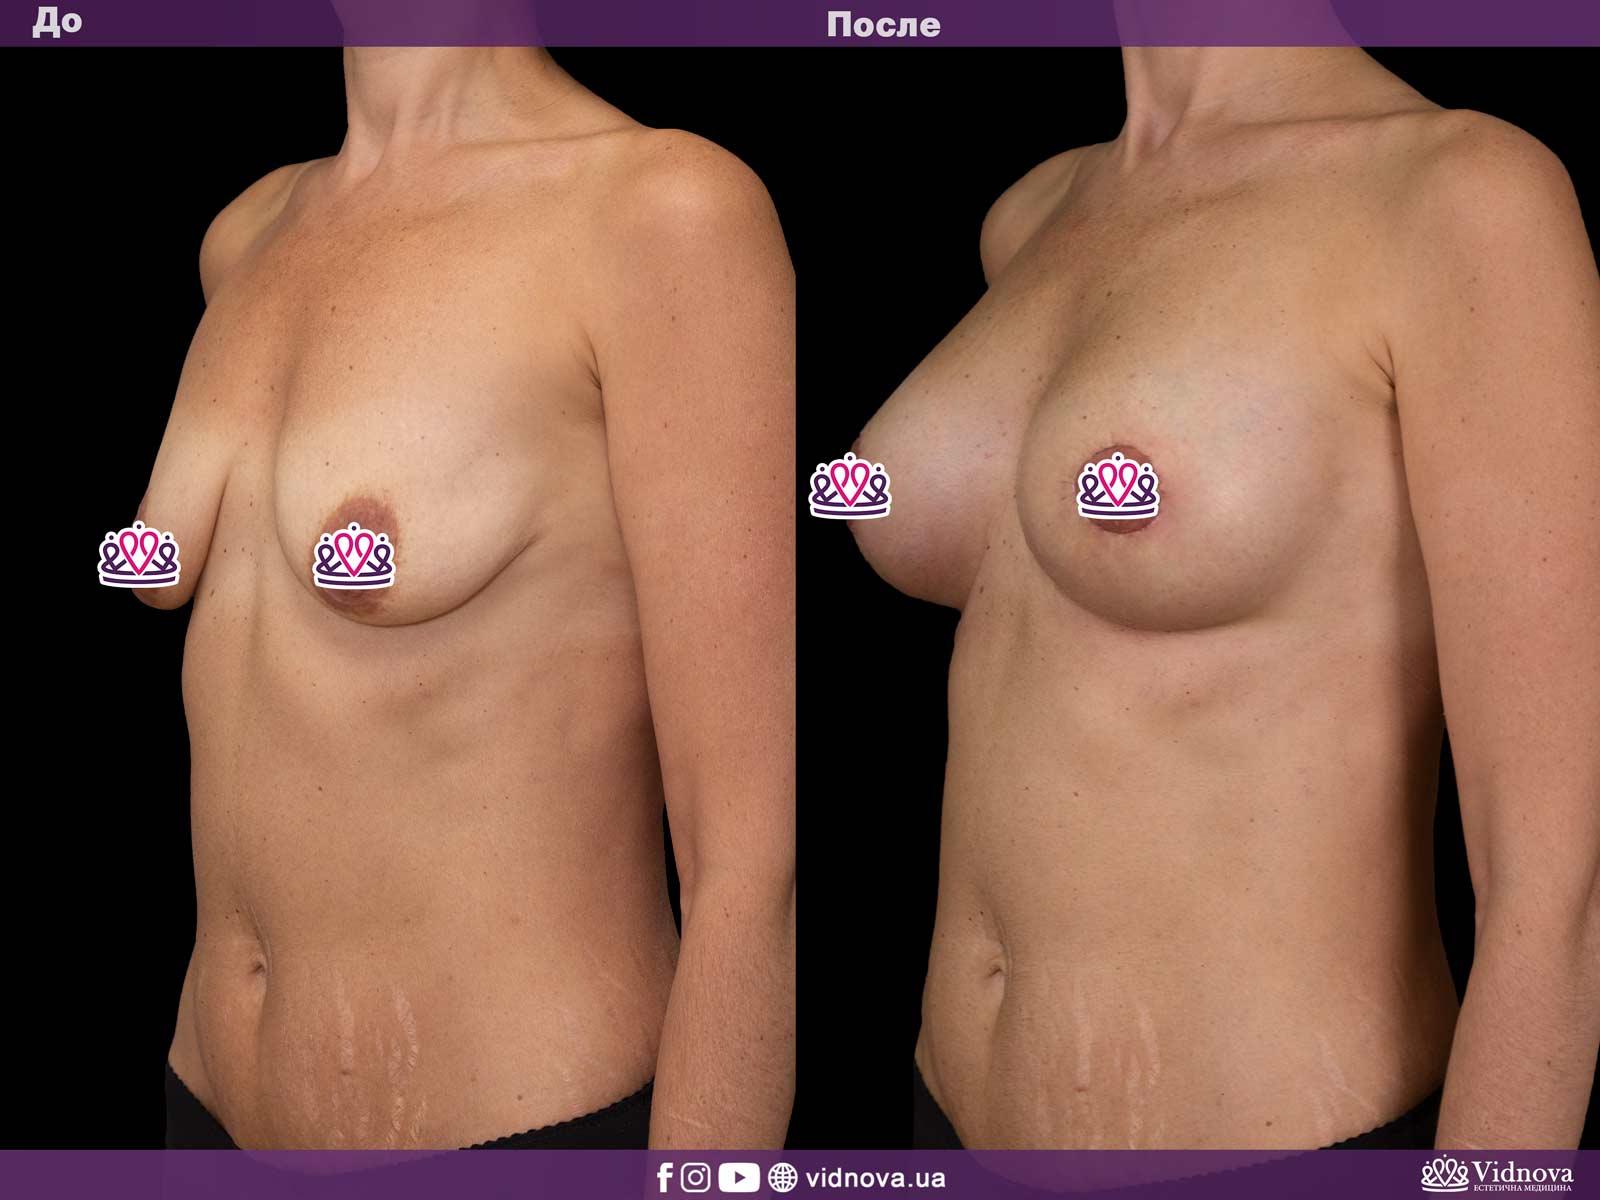 Подтяжка груди: Фото ДО и ПОСЛЕ - Пример №9-2 - Клиника Vidnova